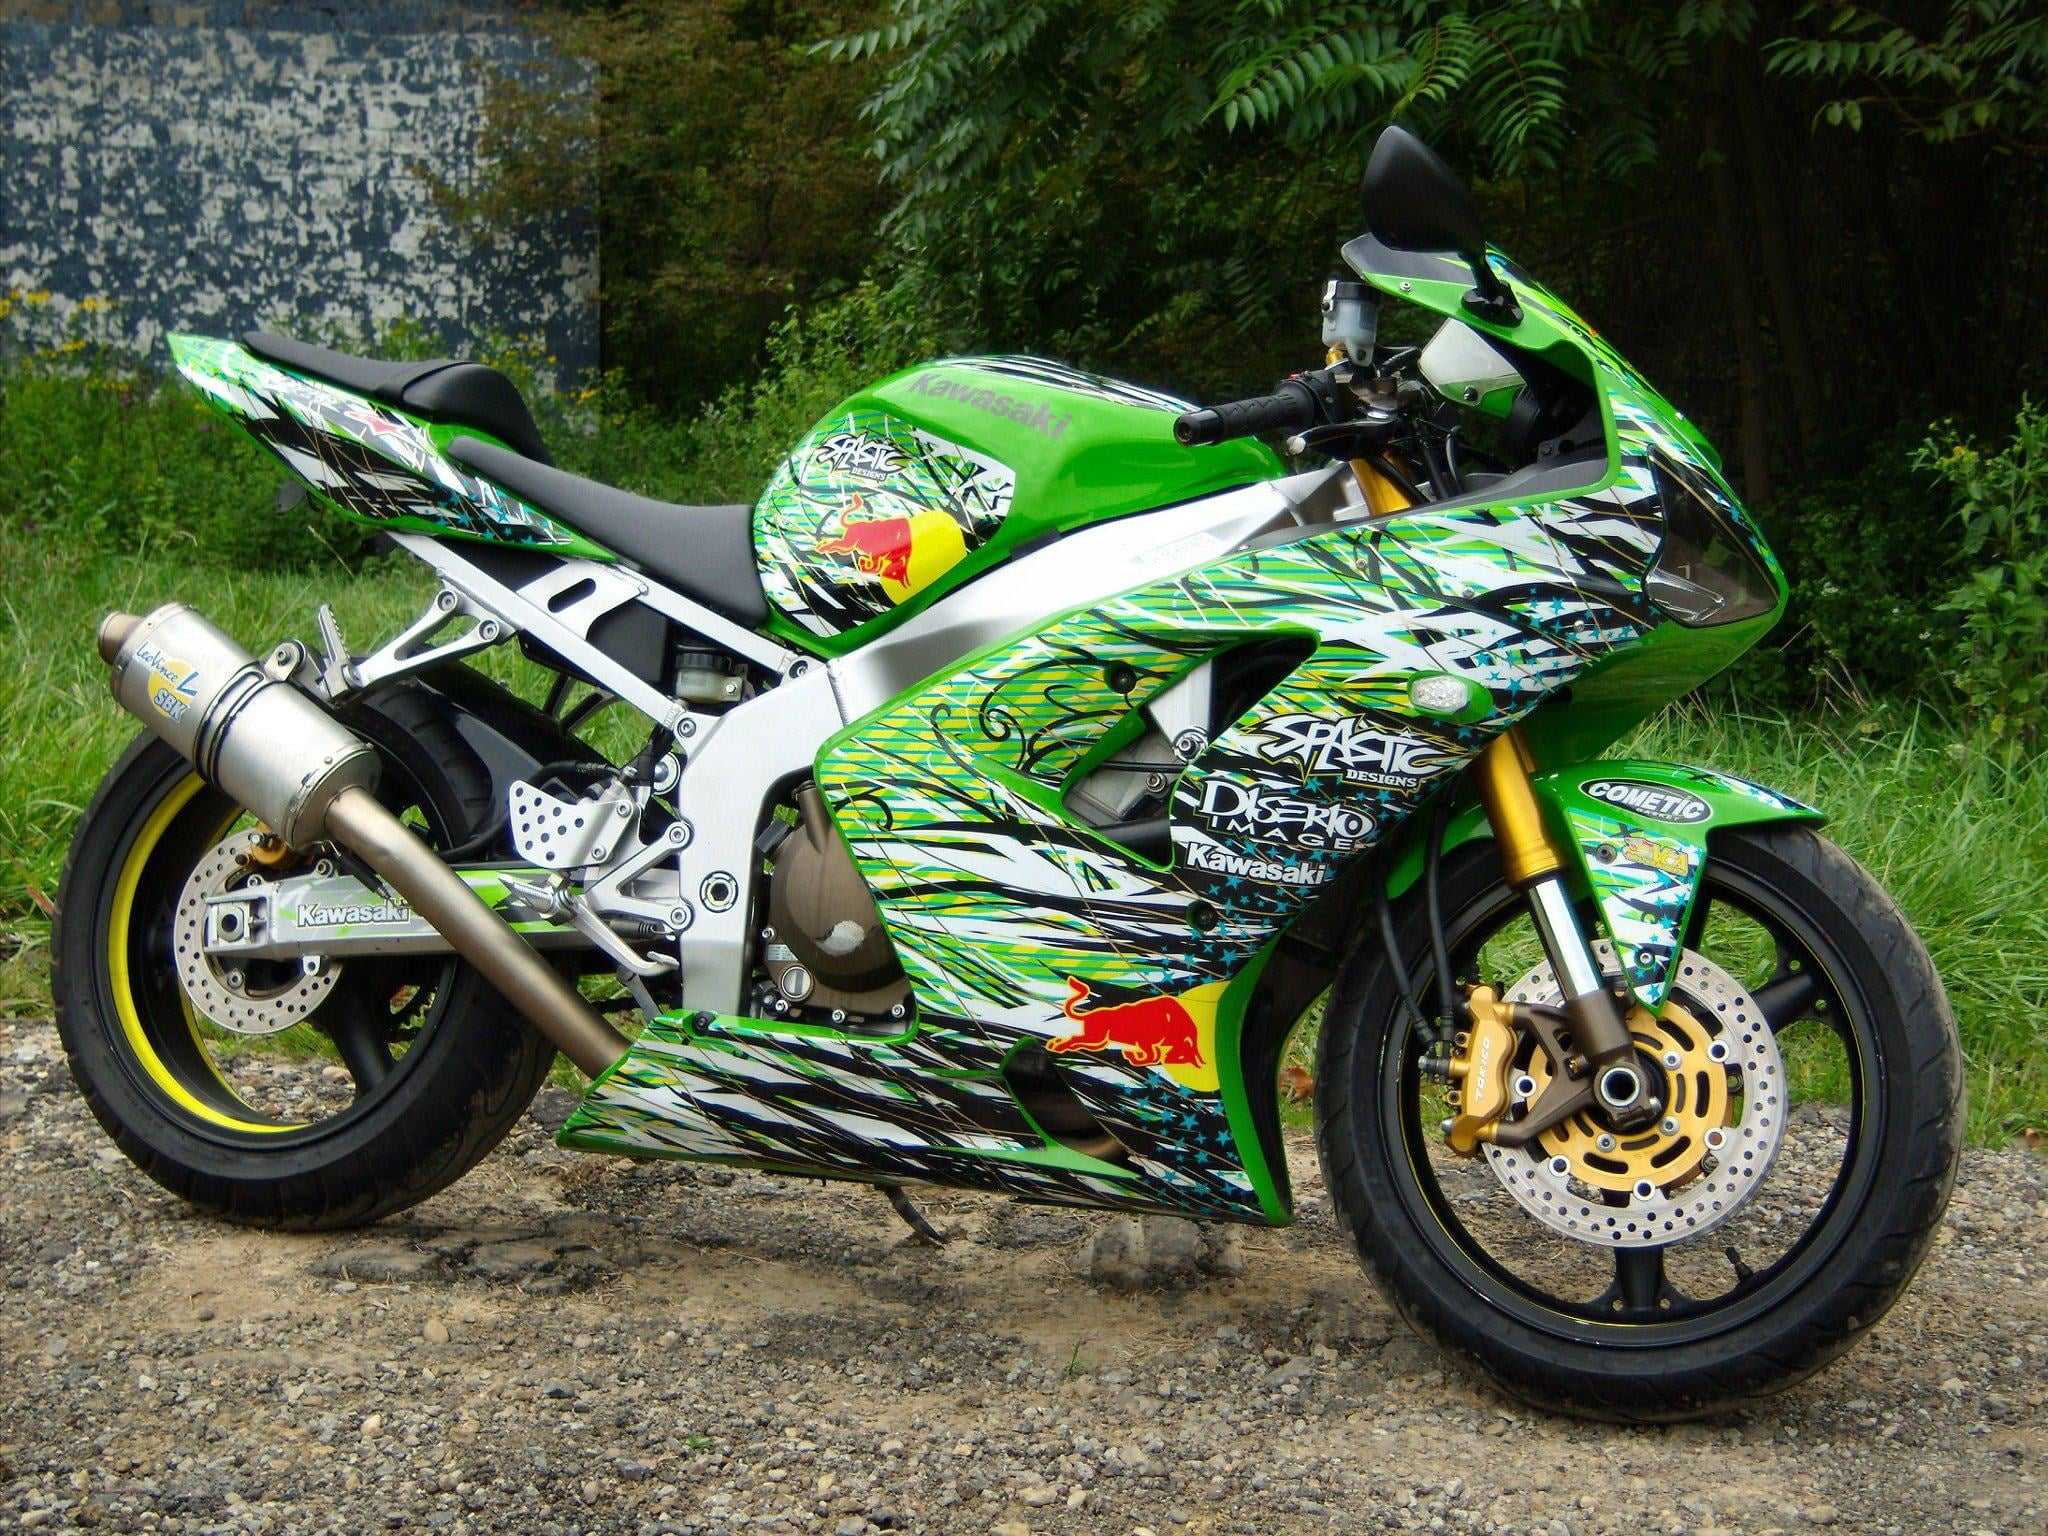 spastic-designs-street-bike-graphics-kawasaki-banner1.jpg